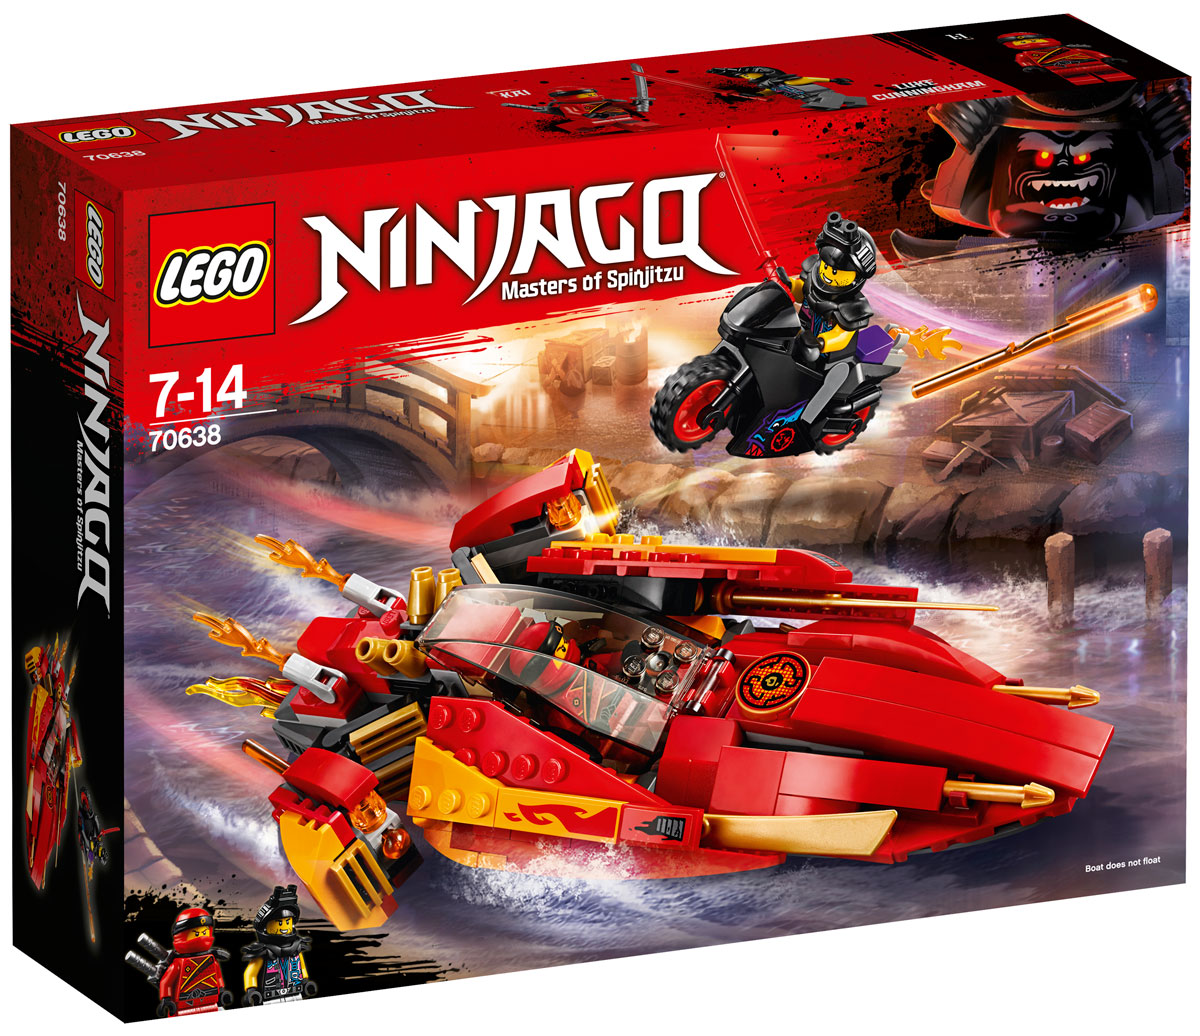 LEGO Ninjago Конструктор Катана V11 70638 lego ninjago 70737 битва механических титанов